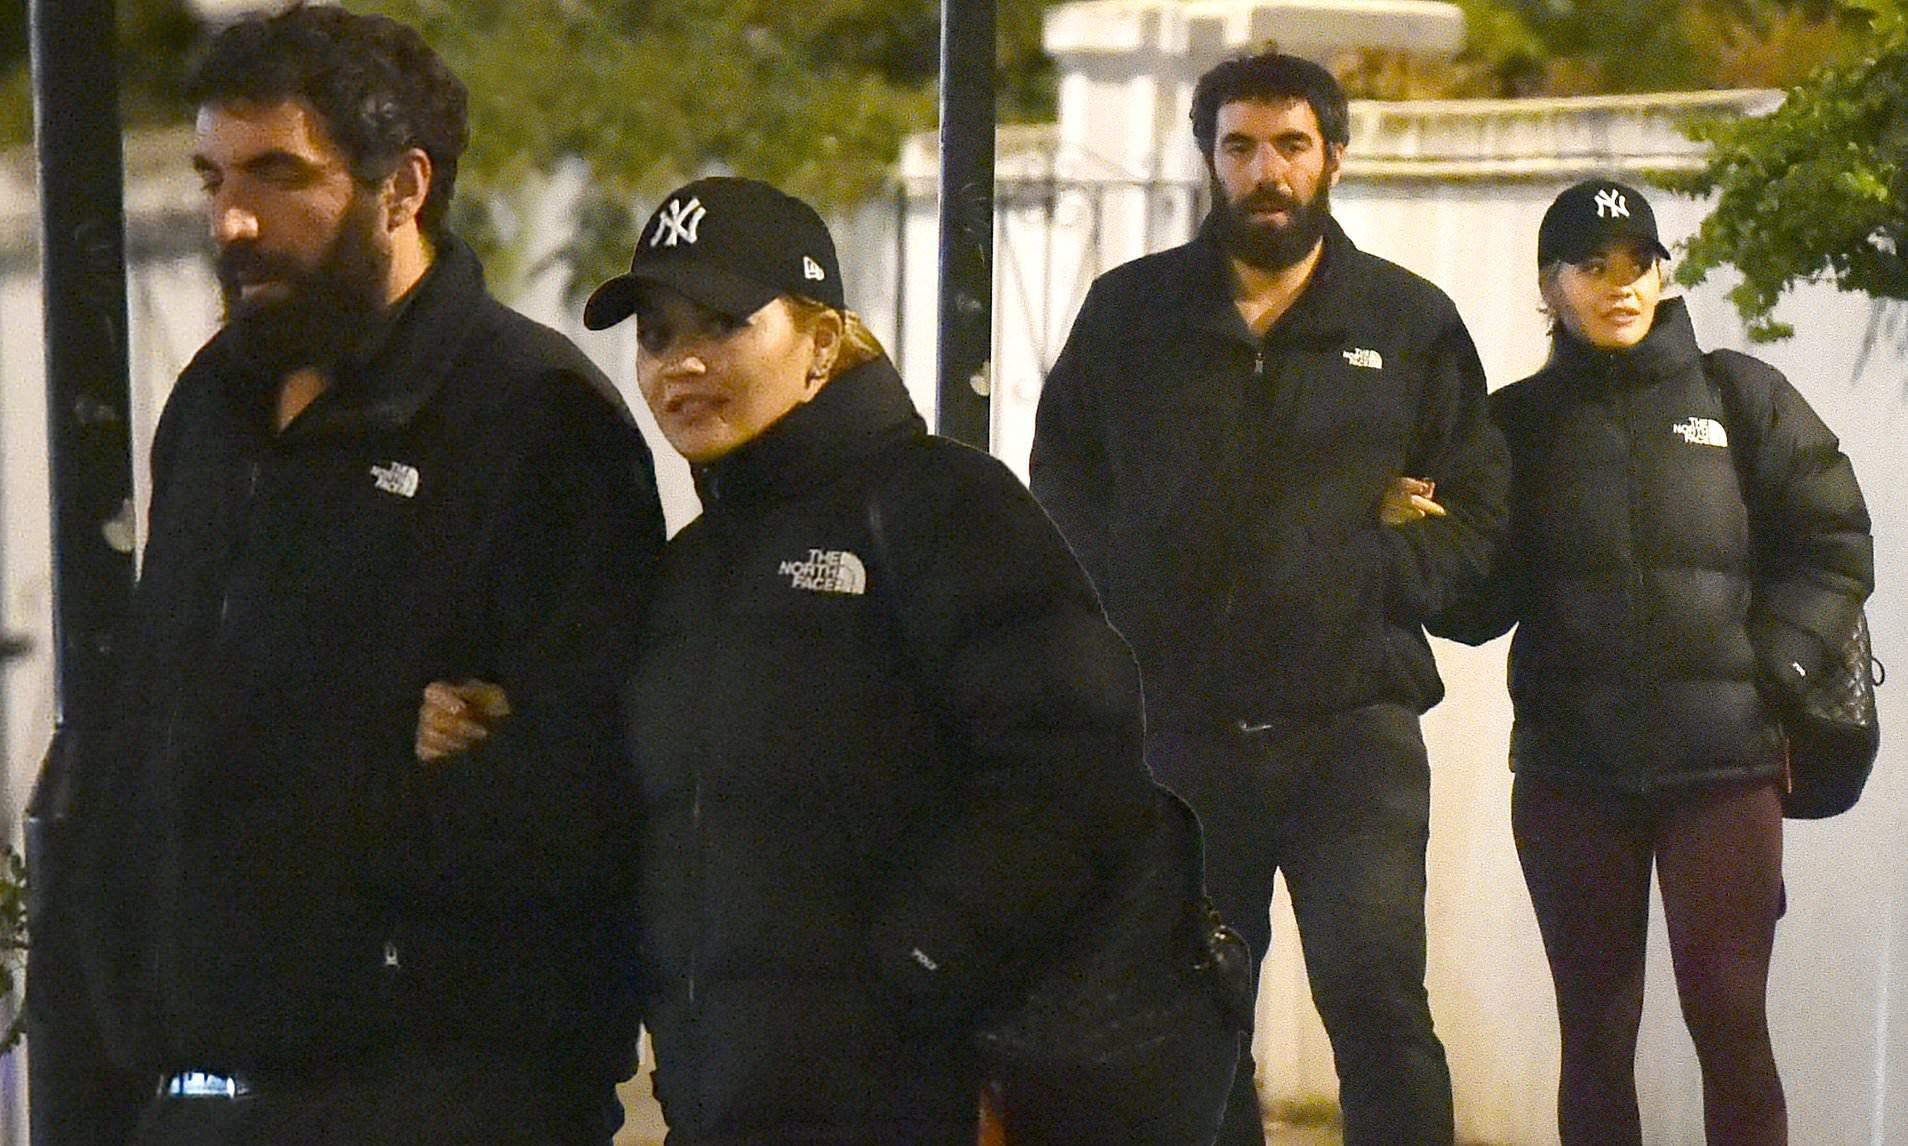 Rita Ora?s boyfriend Romain Gavras confirms their split after lockdown forced them apart